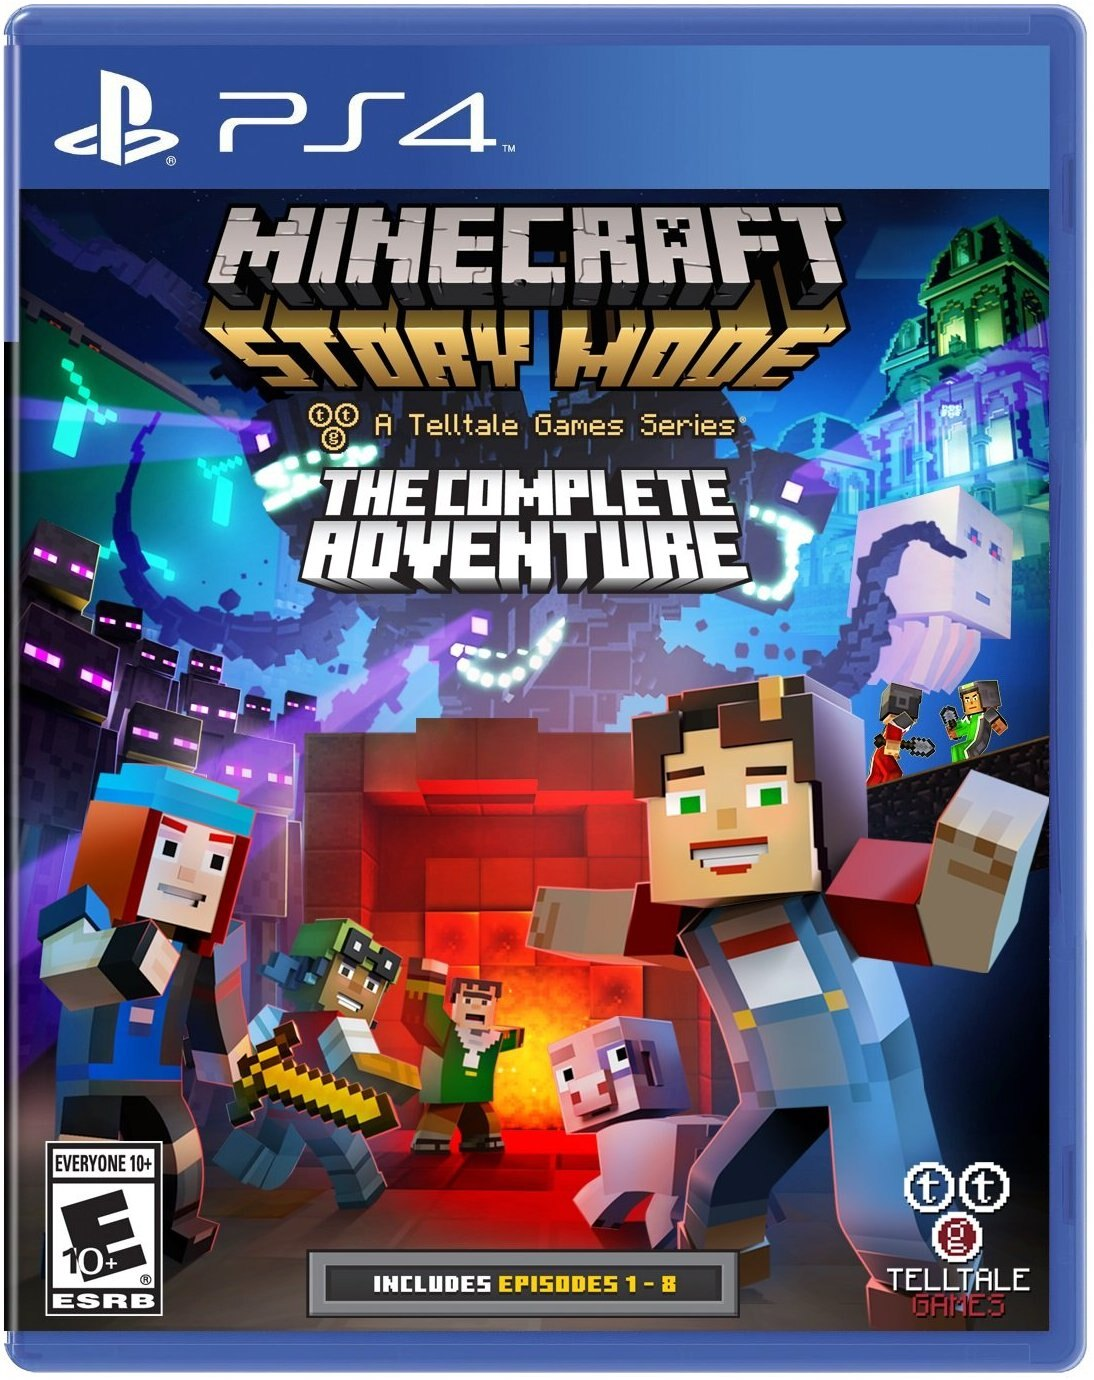 PS4 我的世界:故事劇情模式完整版(含1-8章節) -中文英文美版-Minecraft Story Mode Complete Edition